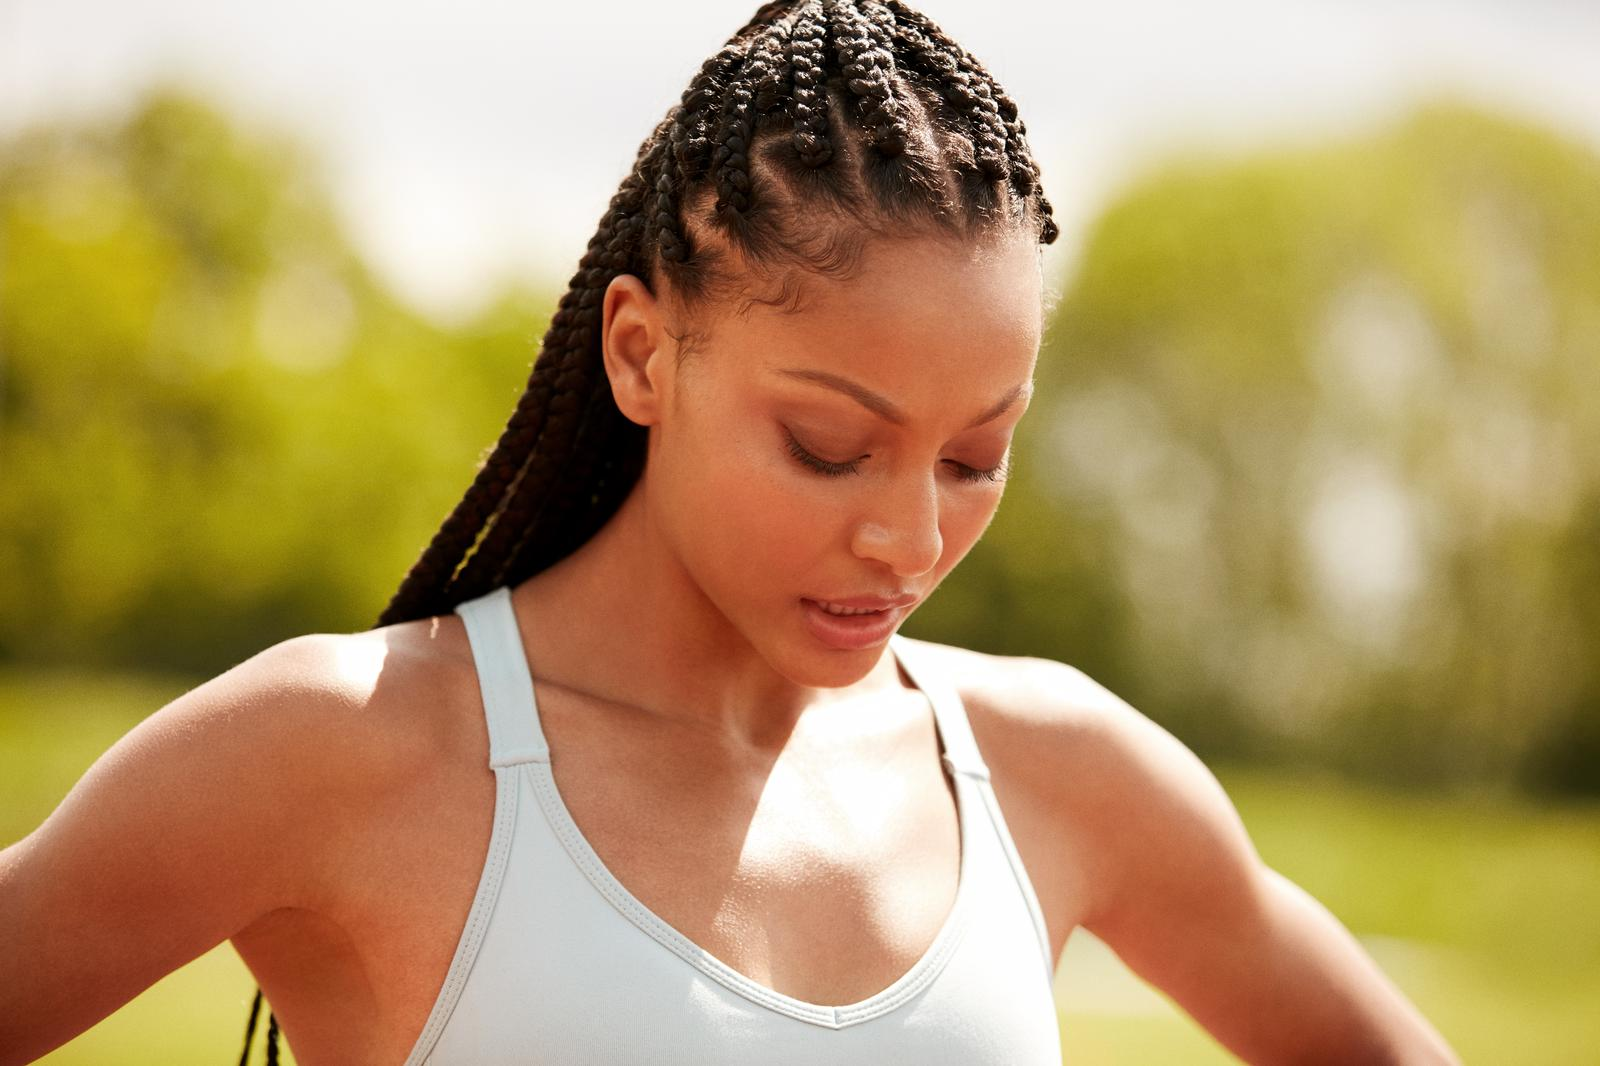 5 manieren om met stress om te gaan